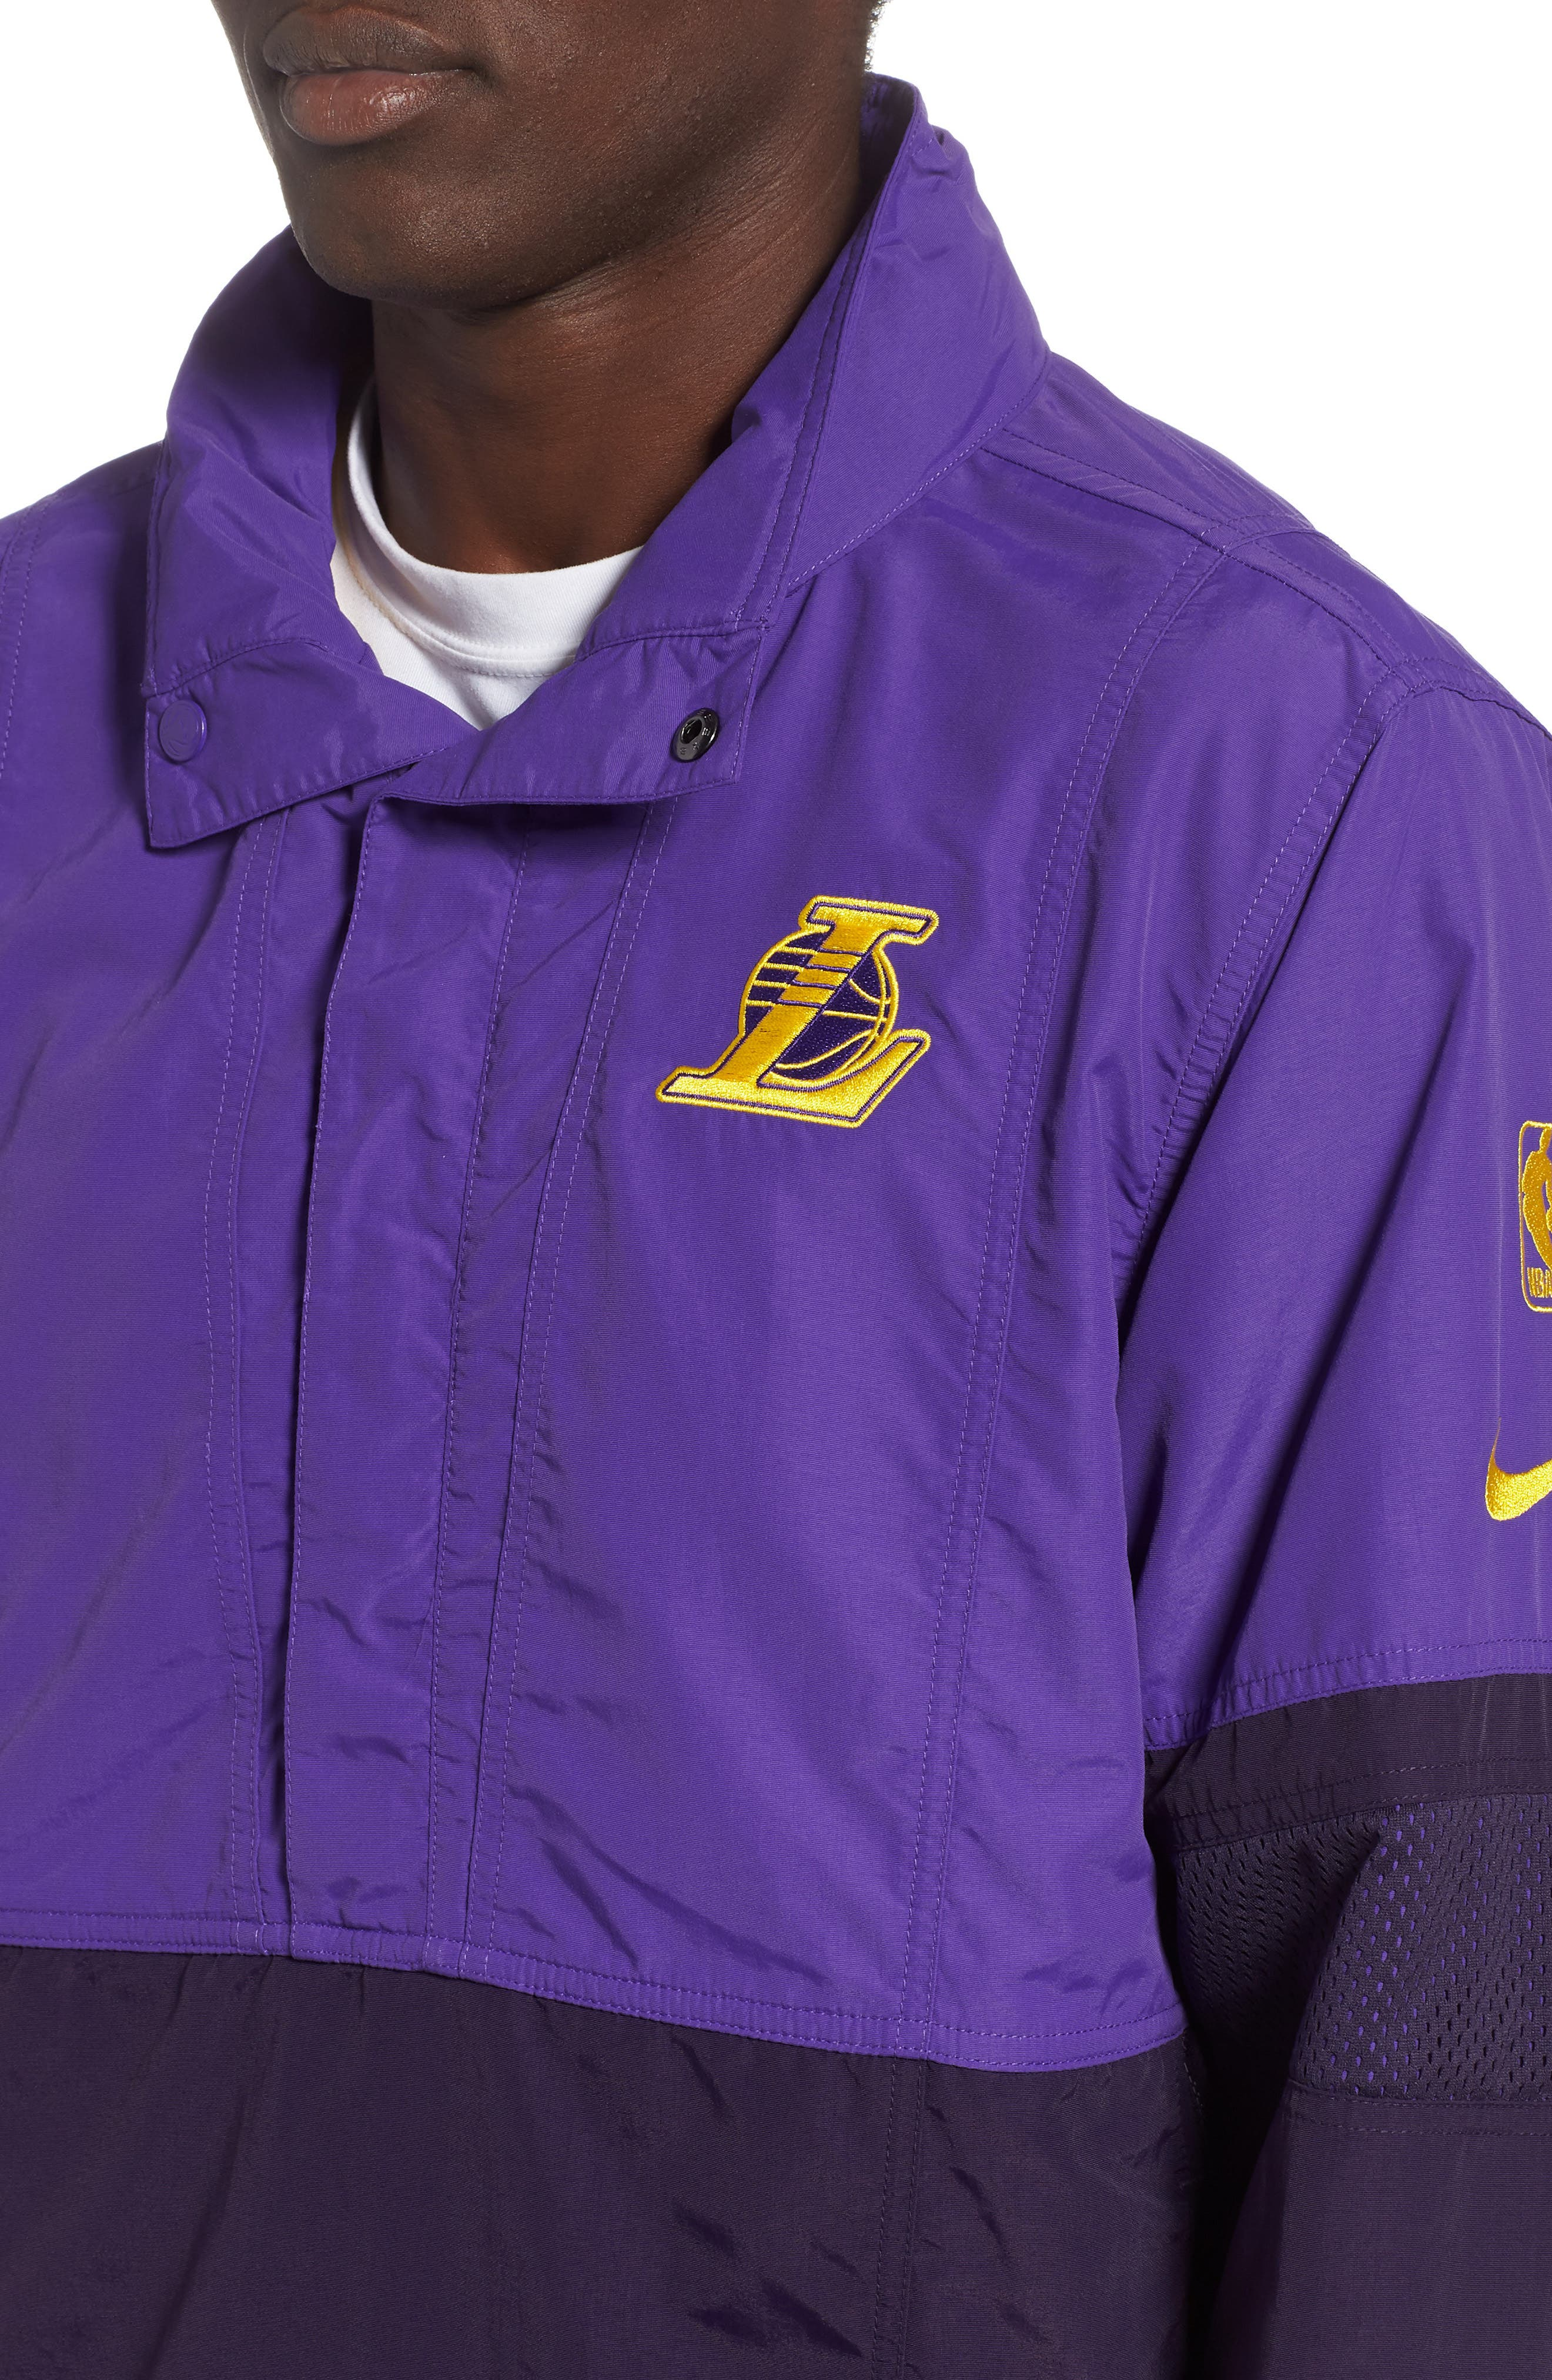 Los Angeles Lakers Courtside Warm-Up Jacket,                             Alternate thumbnail 4, color,                             FIELD PURPLE/PURPLE/ AMARILLO